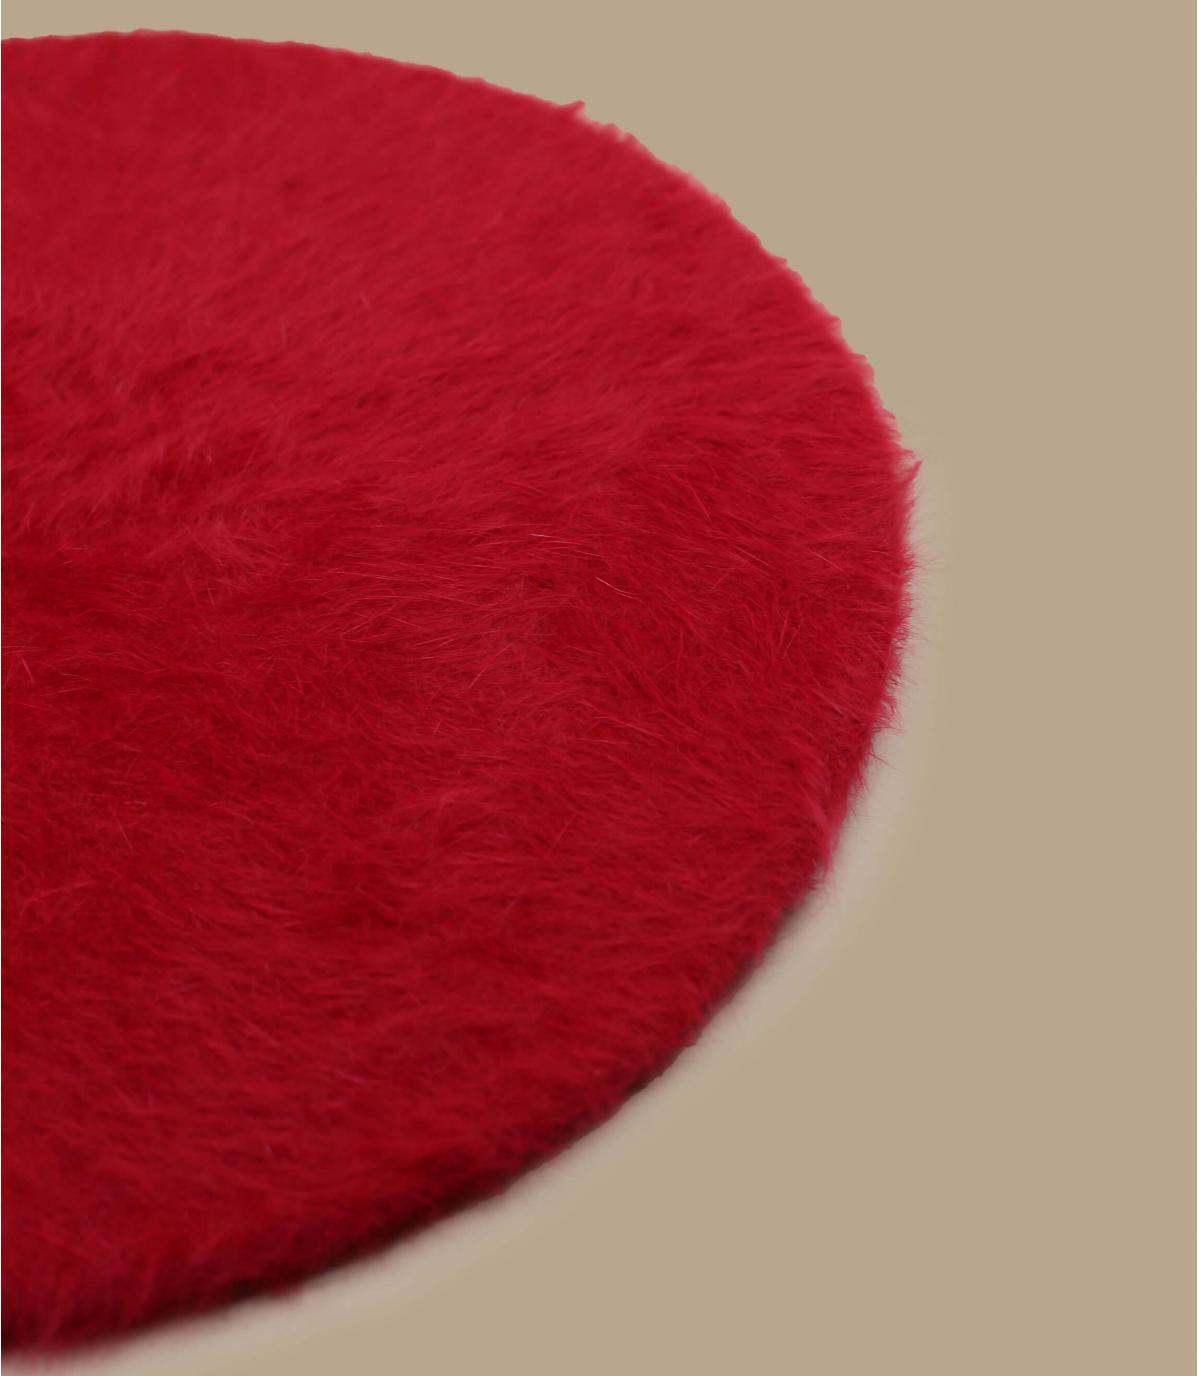 Dettagli Berretto angora hermes - image 3